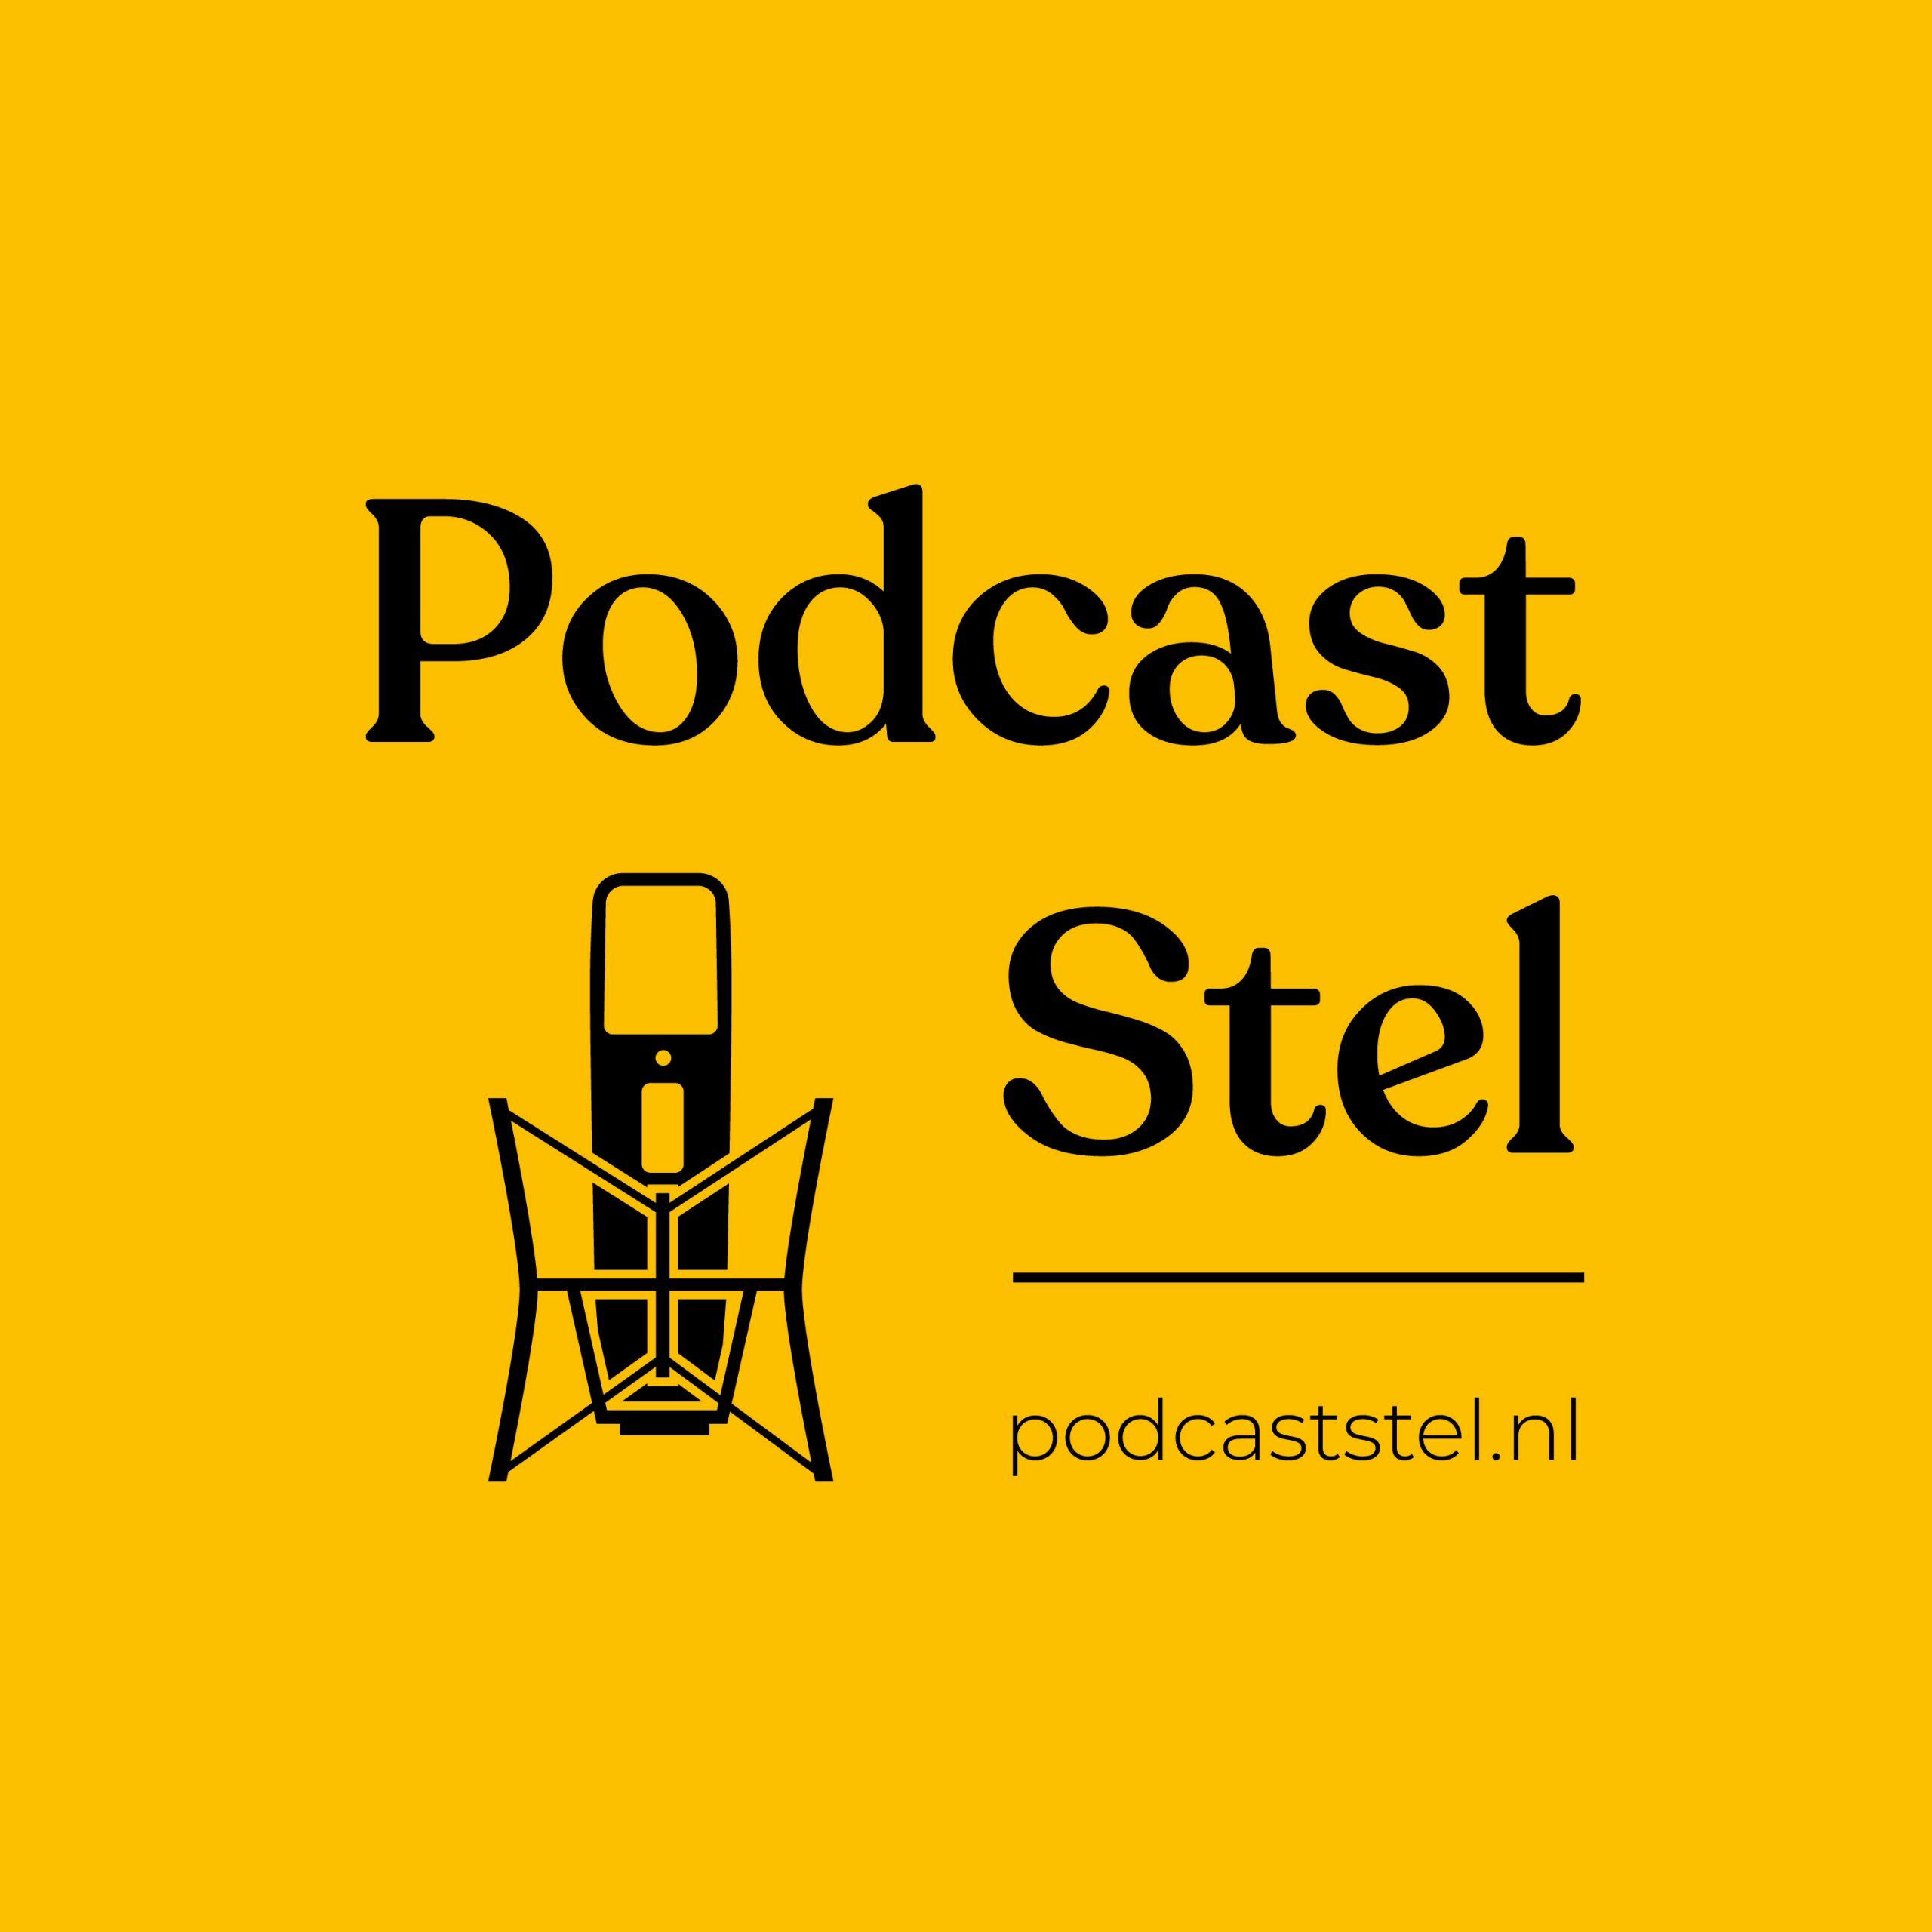 Podcast Stel